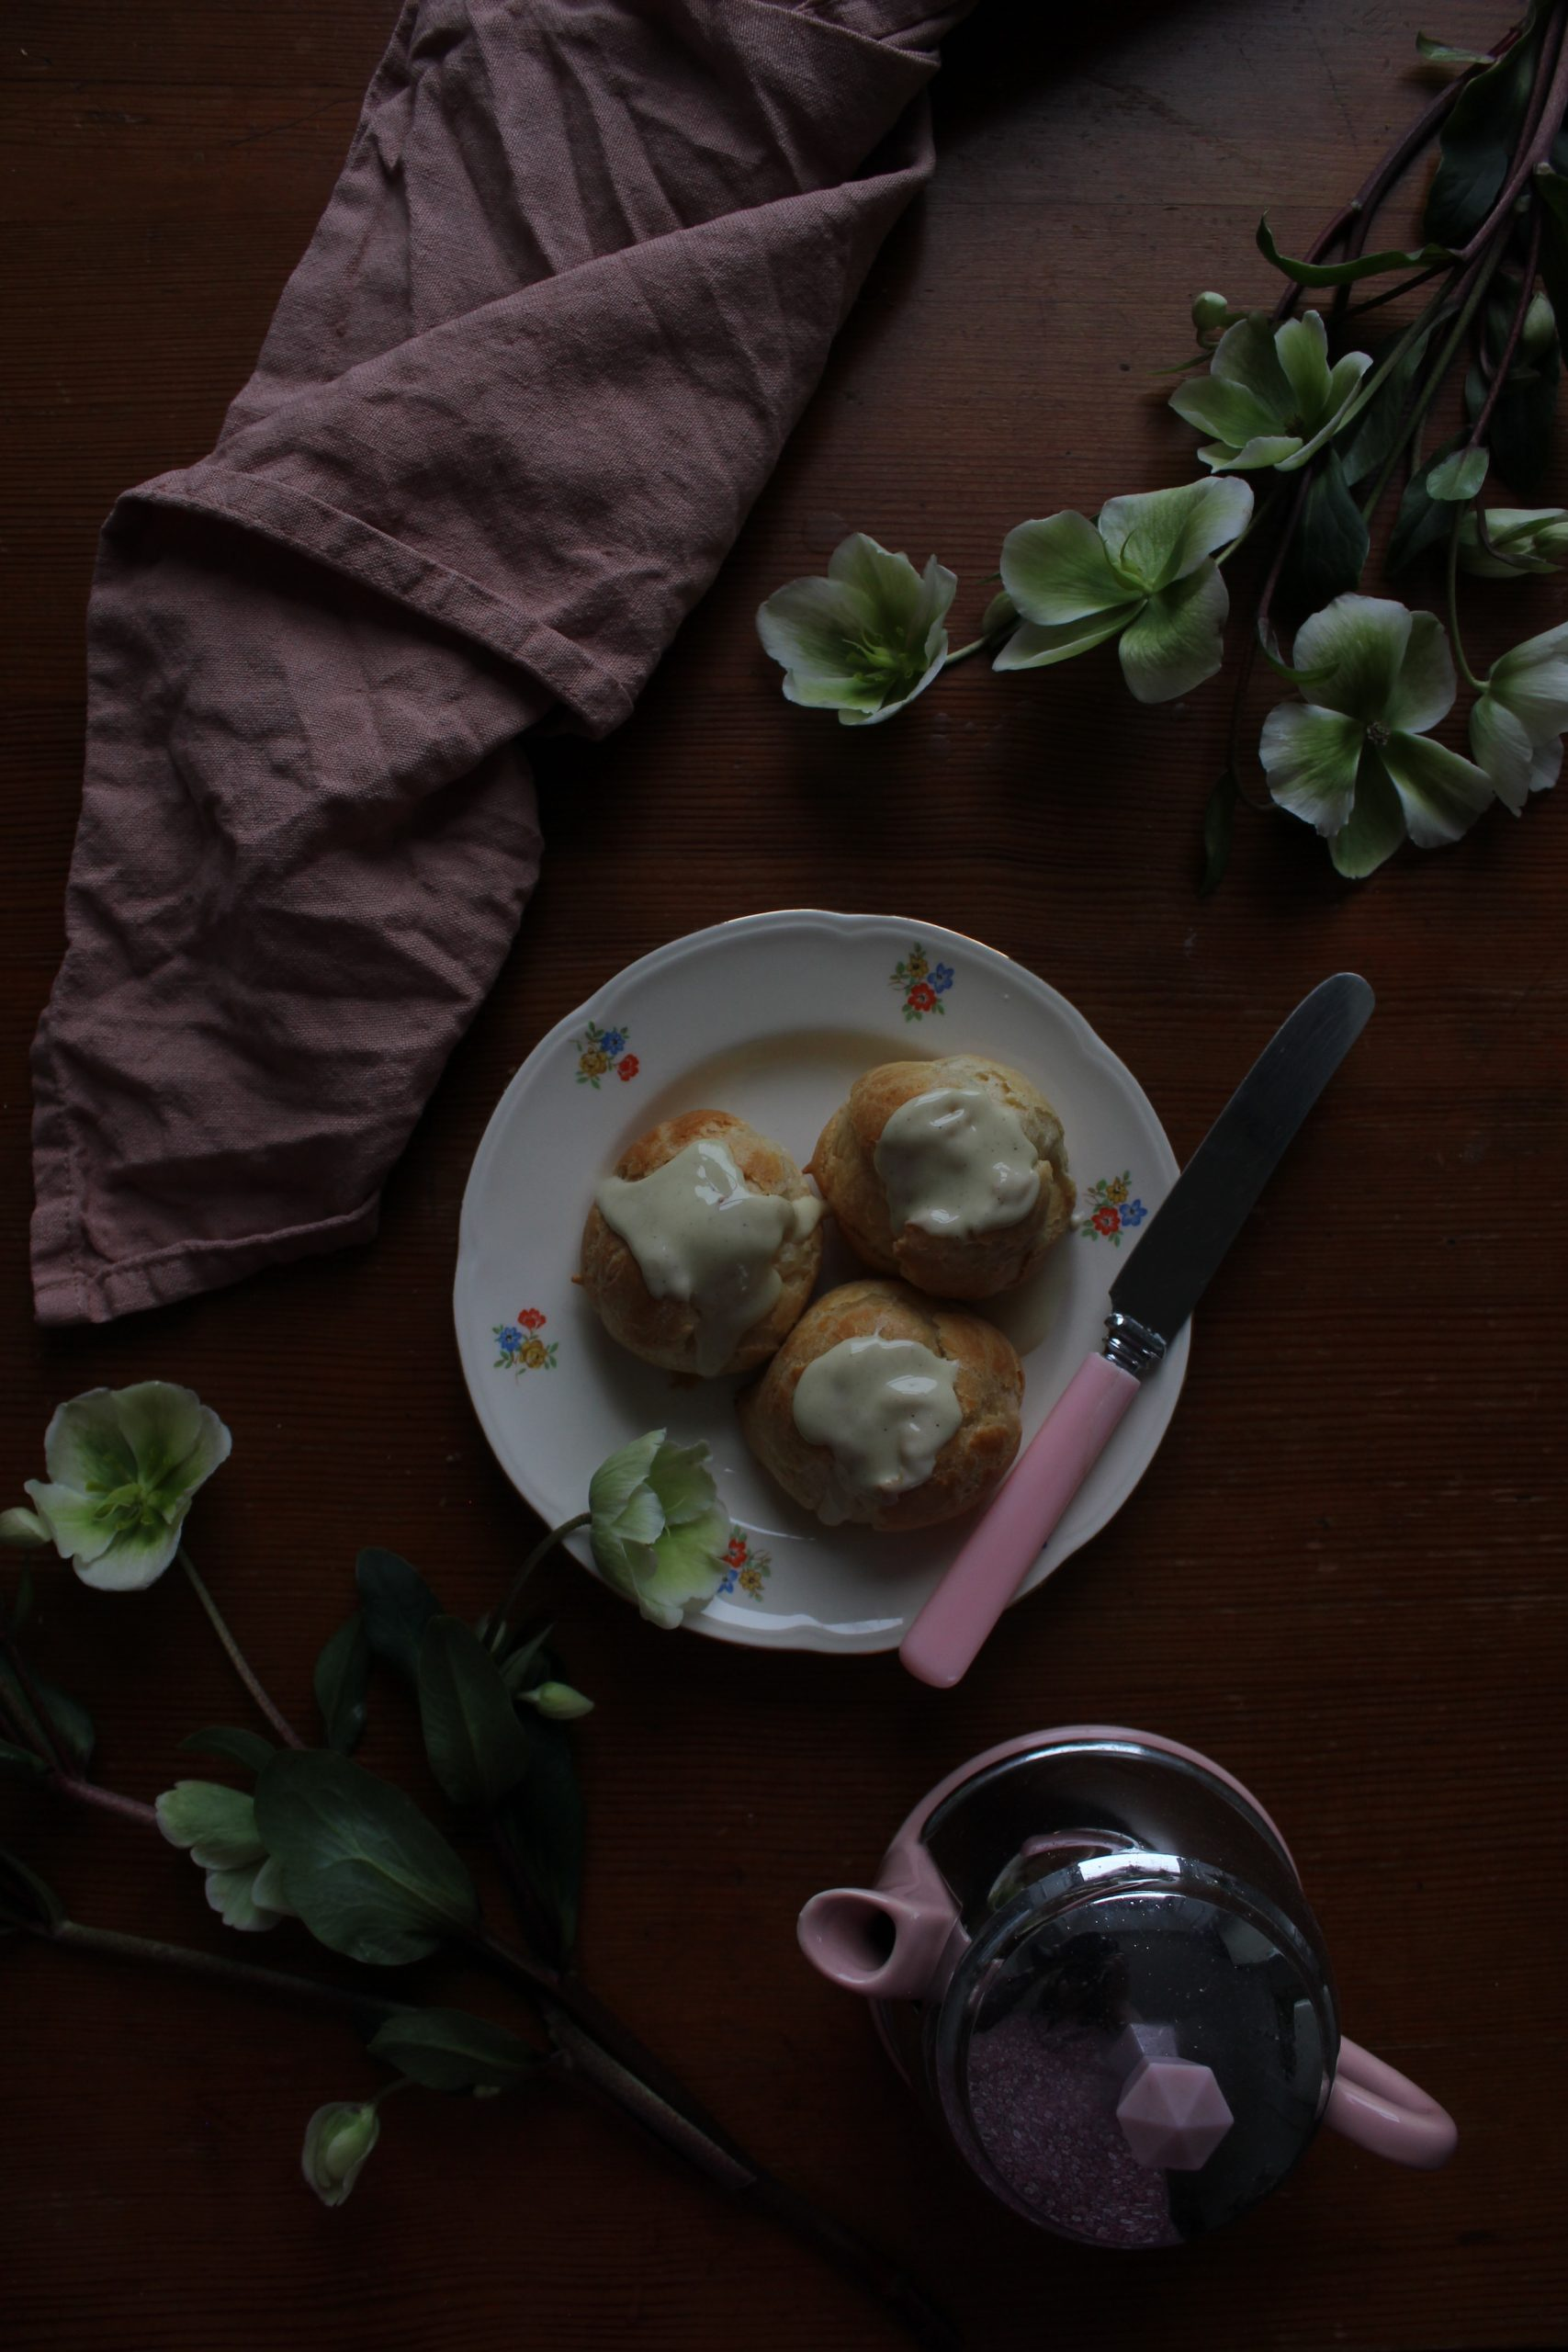 Lemon and White Chocolate Profiteroles